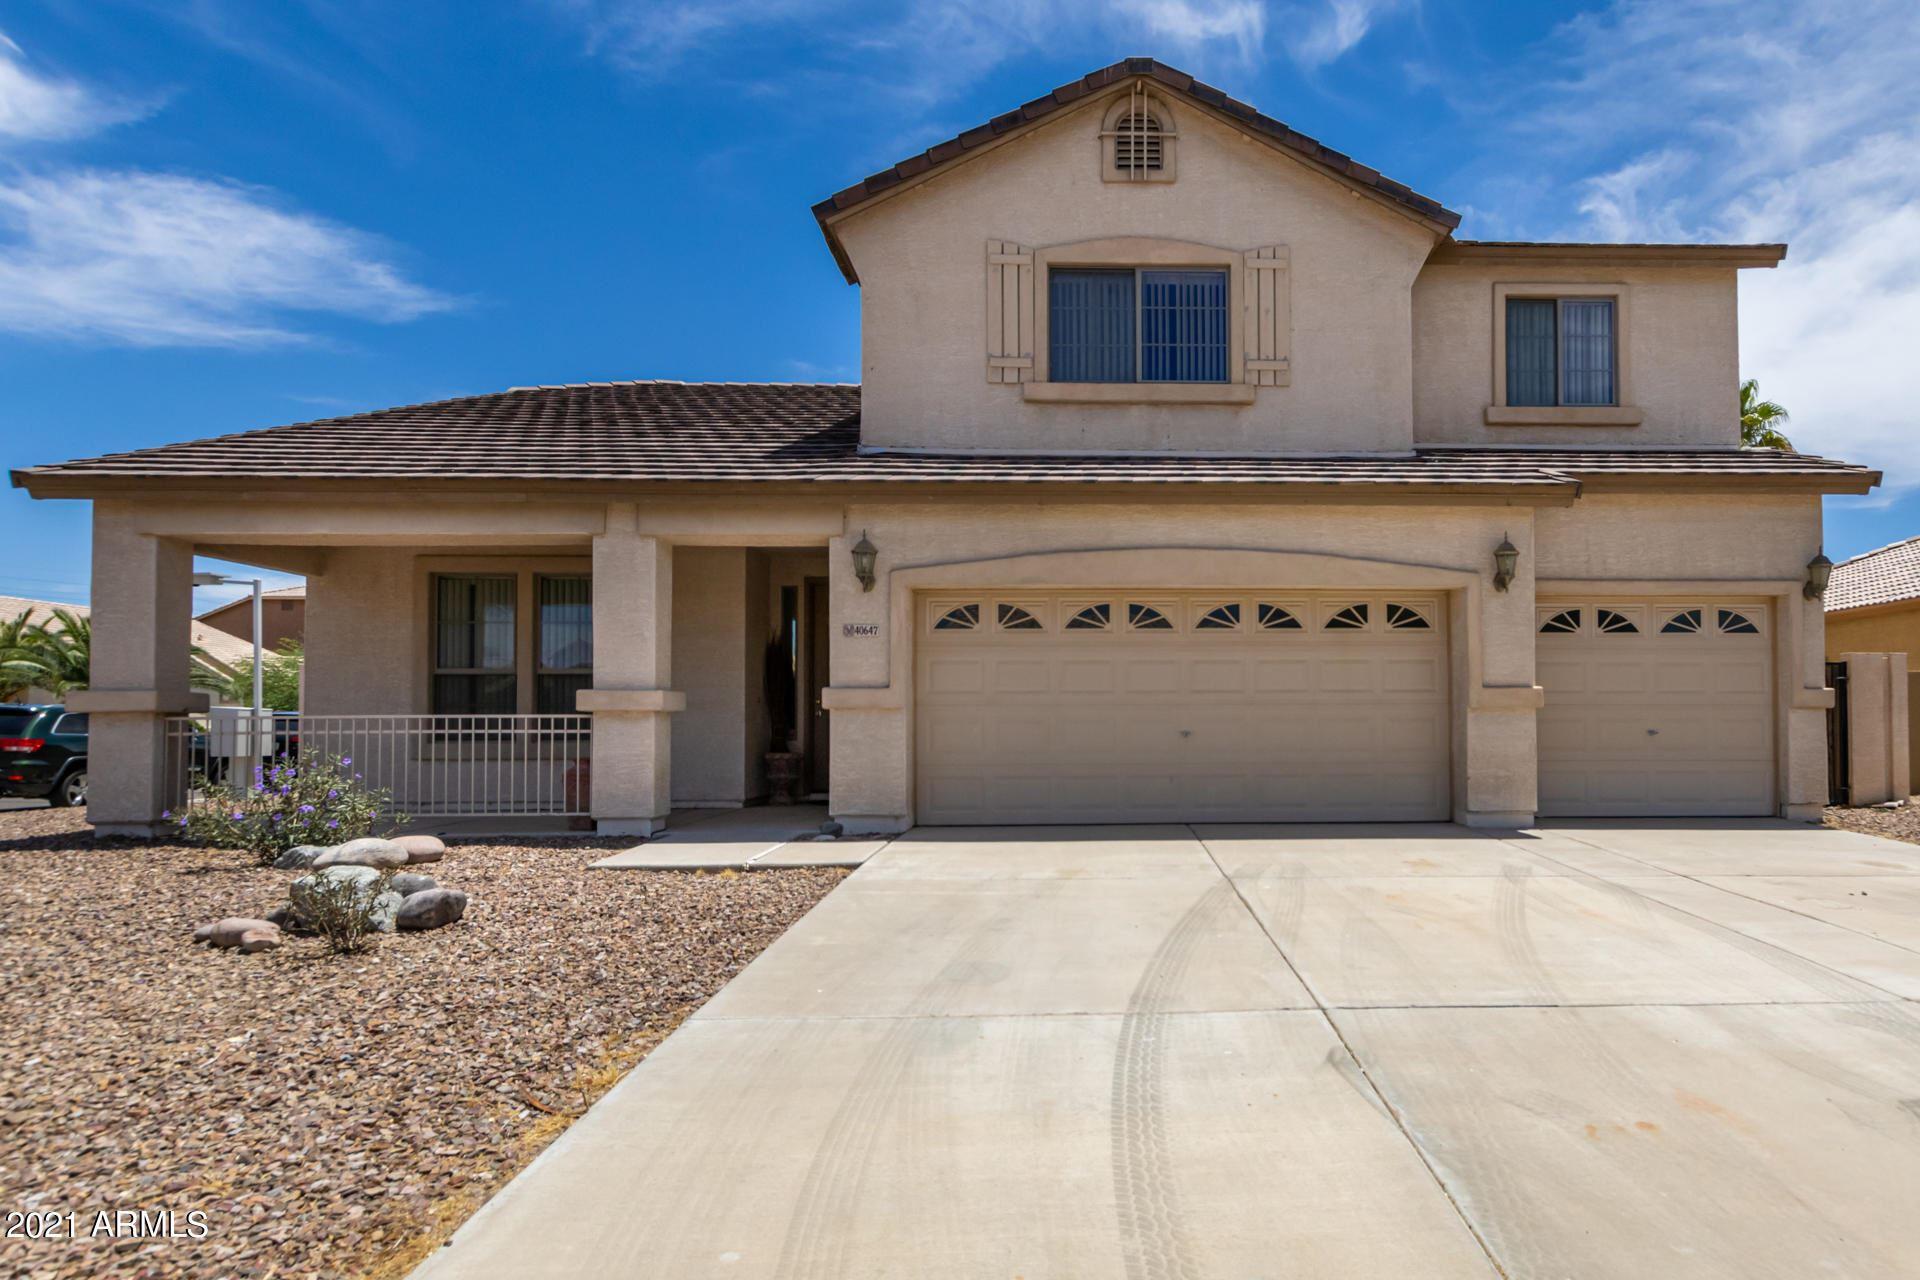 40647 N PARISI Place, San Tan Valley, AZ 85140 - MLS#: 6249352